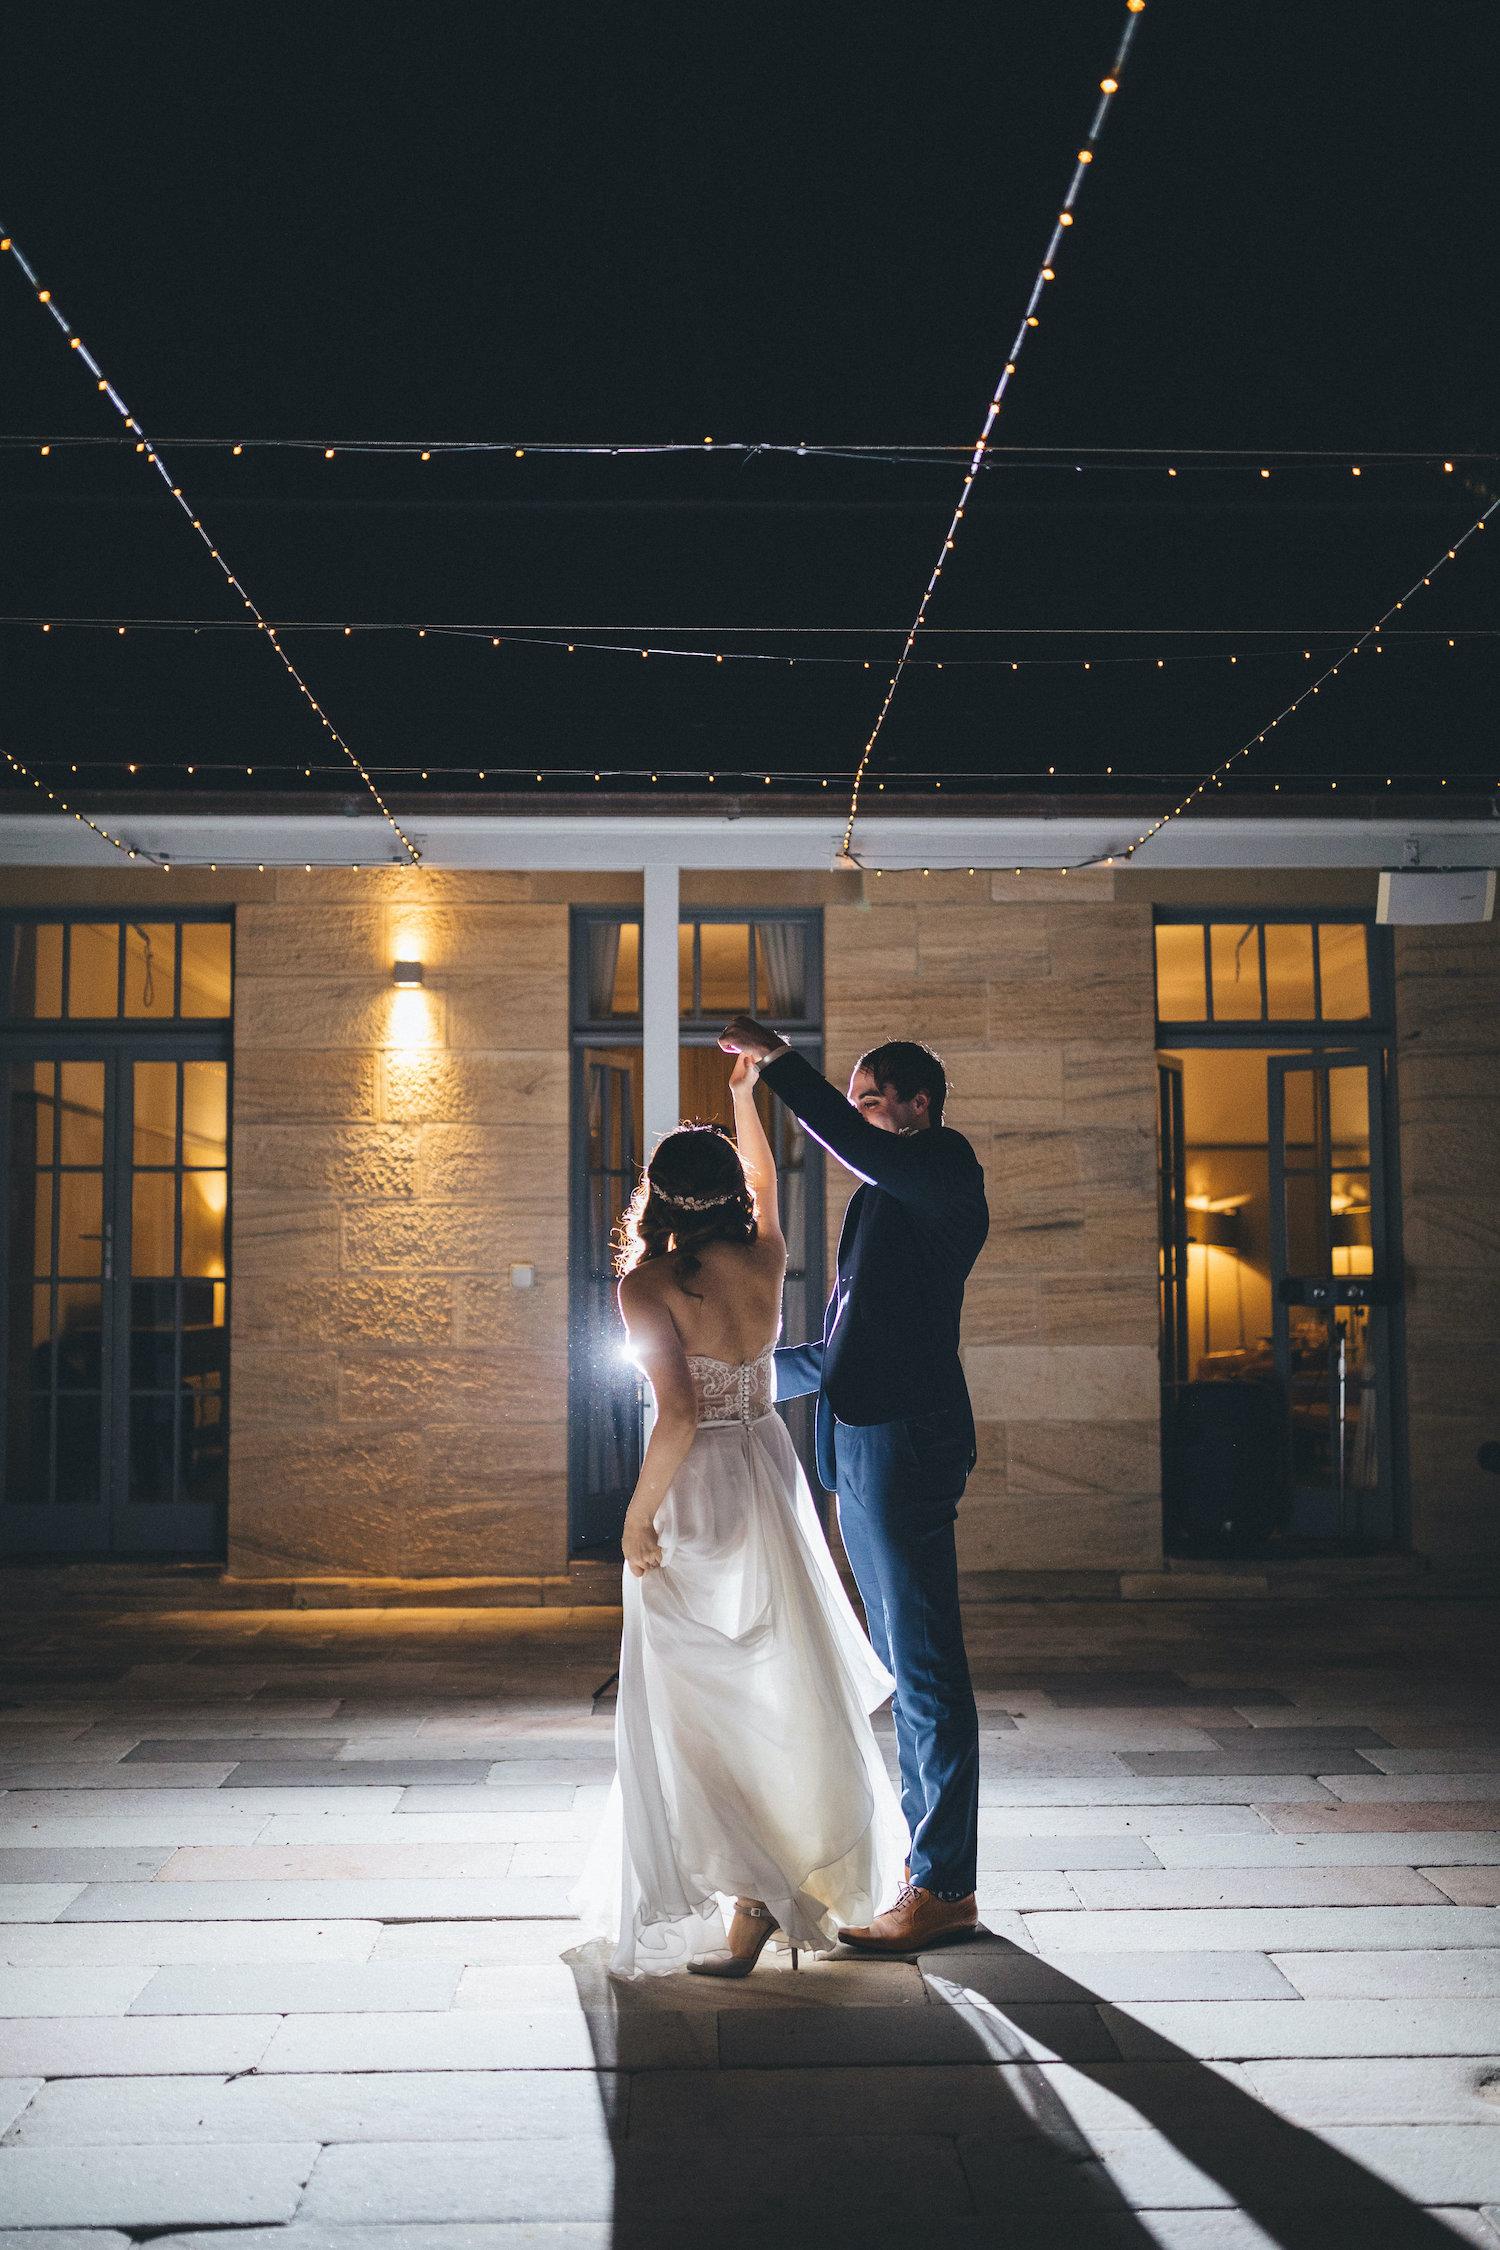 gunners barracks sydney wedding photographer ann marie yuen